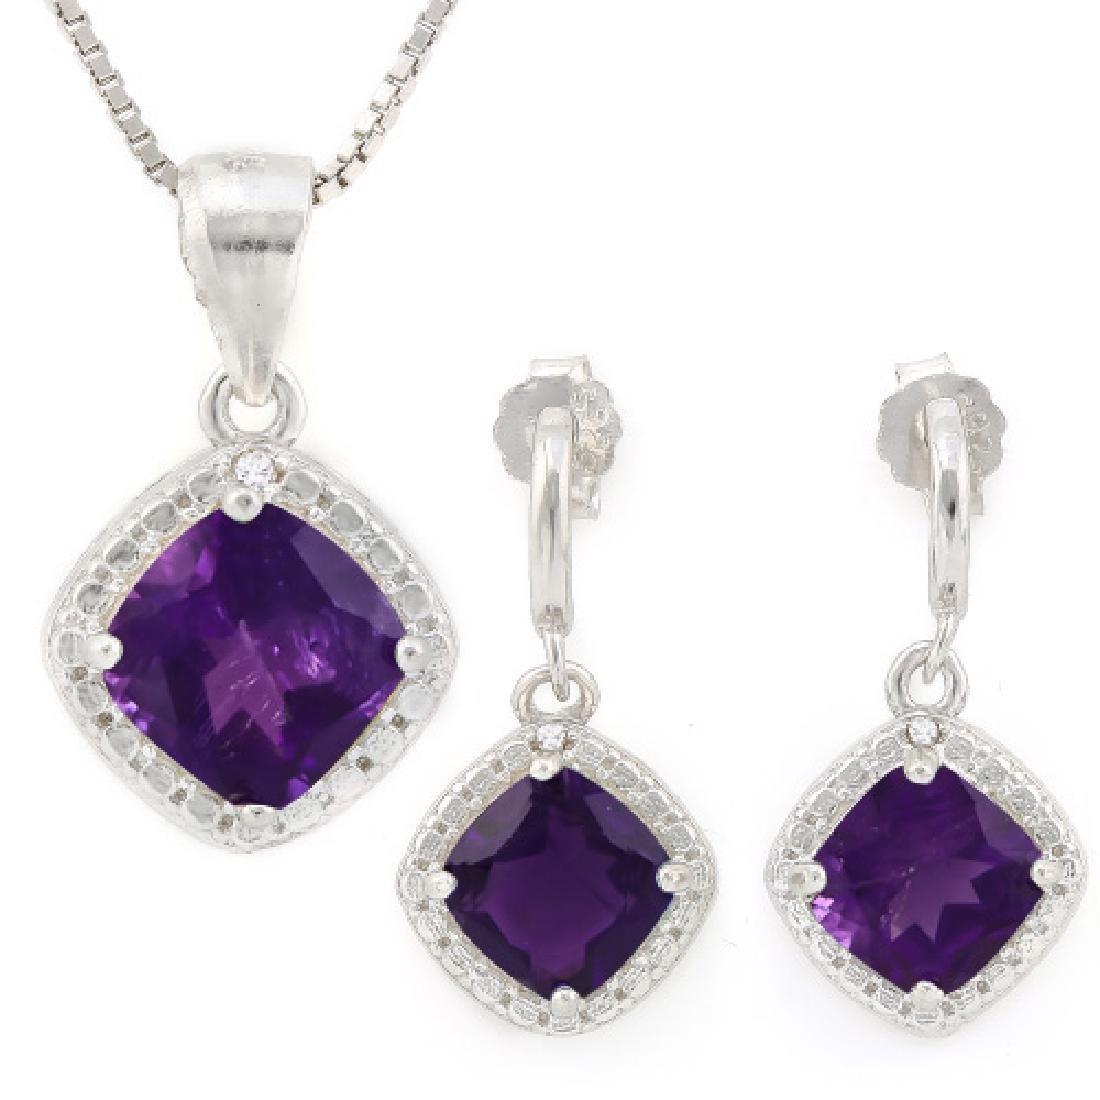 2 3/4 CARAT AMETHYSTS & GENUINE DIAMONDS 925 STERLING S